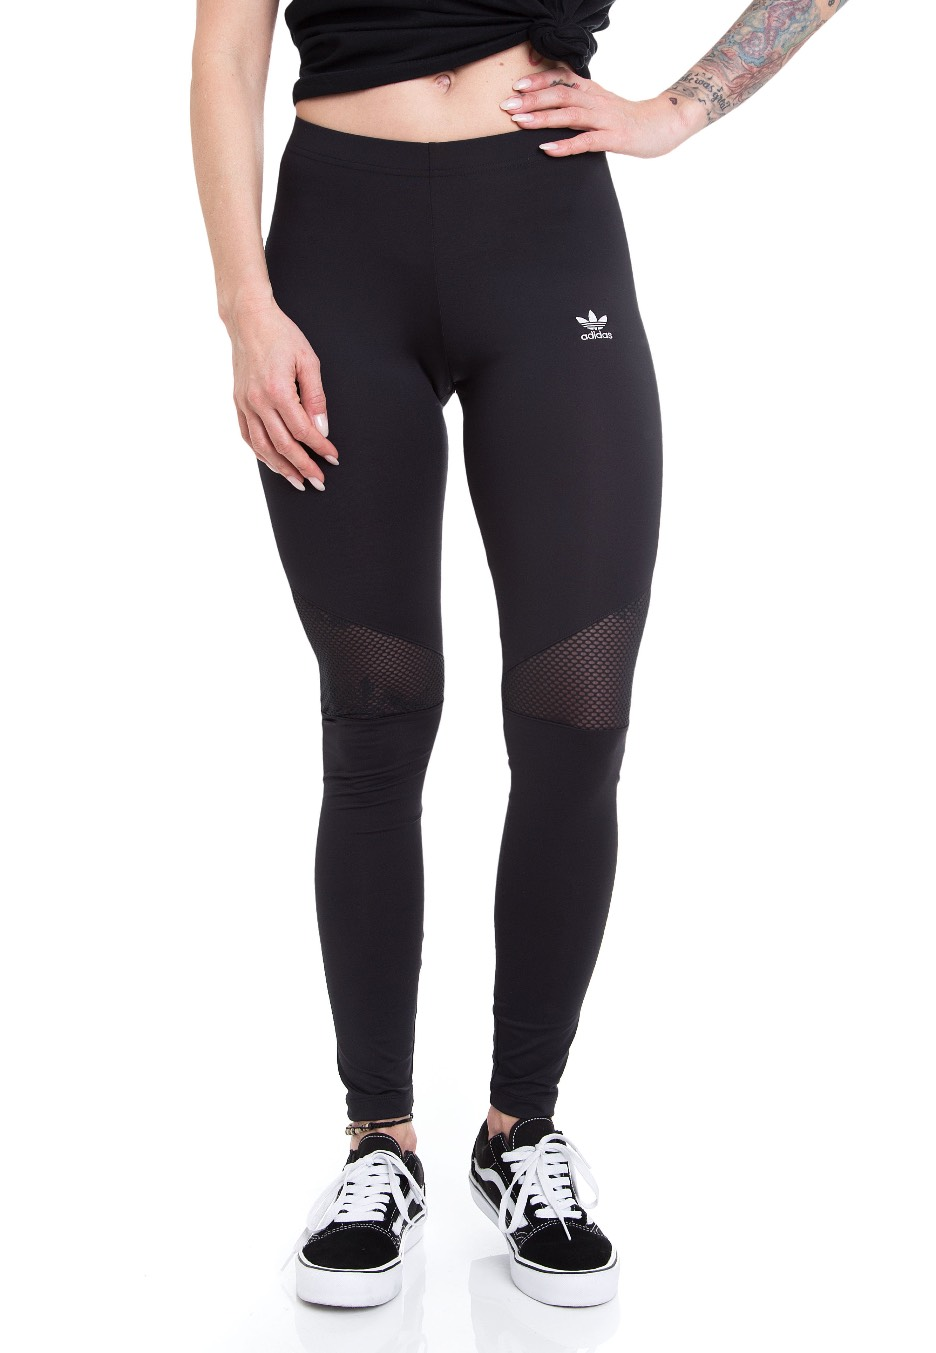 adidas clrdo black leggings streetwear shop. Black Bedroom Furniture Sets. Home Design Ideas